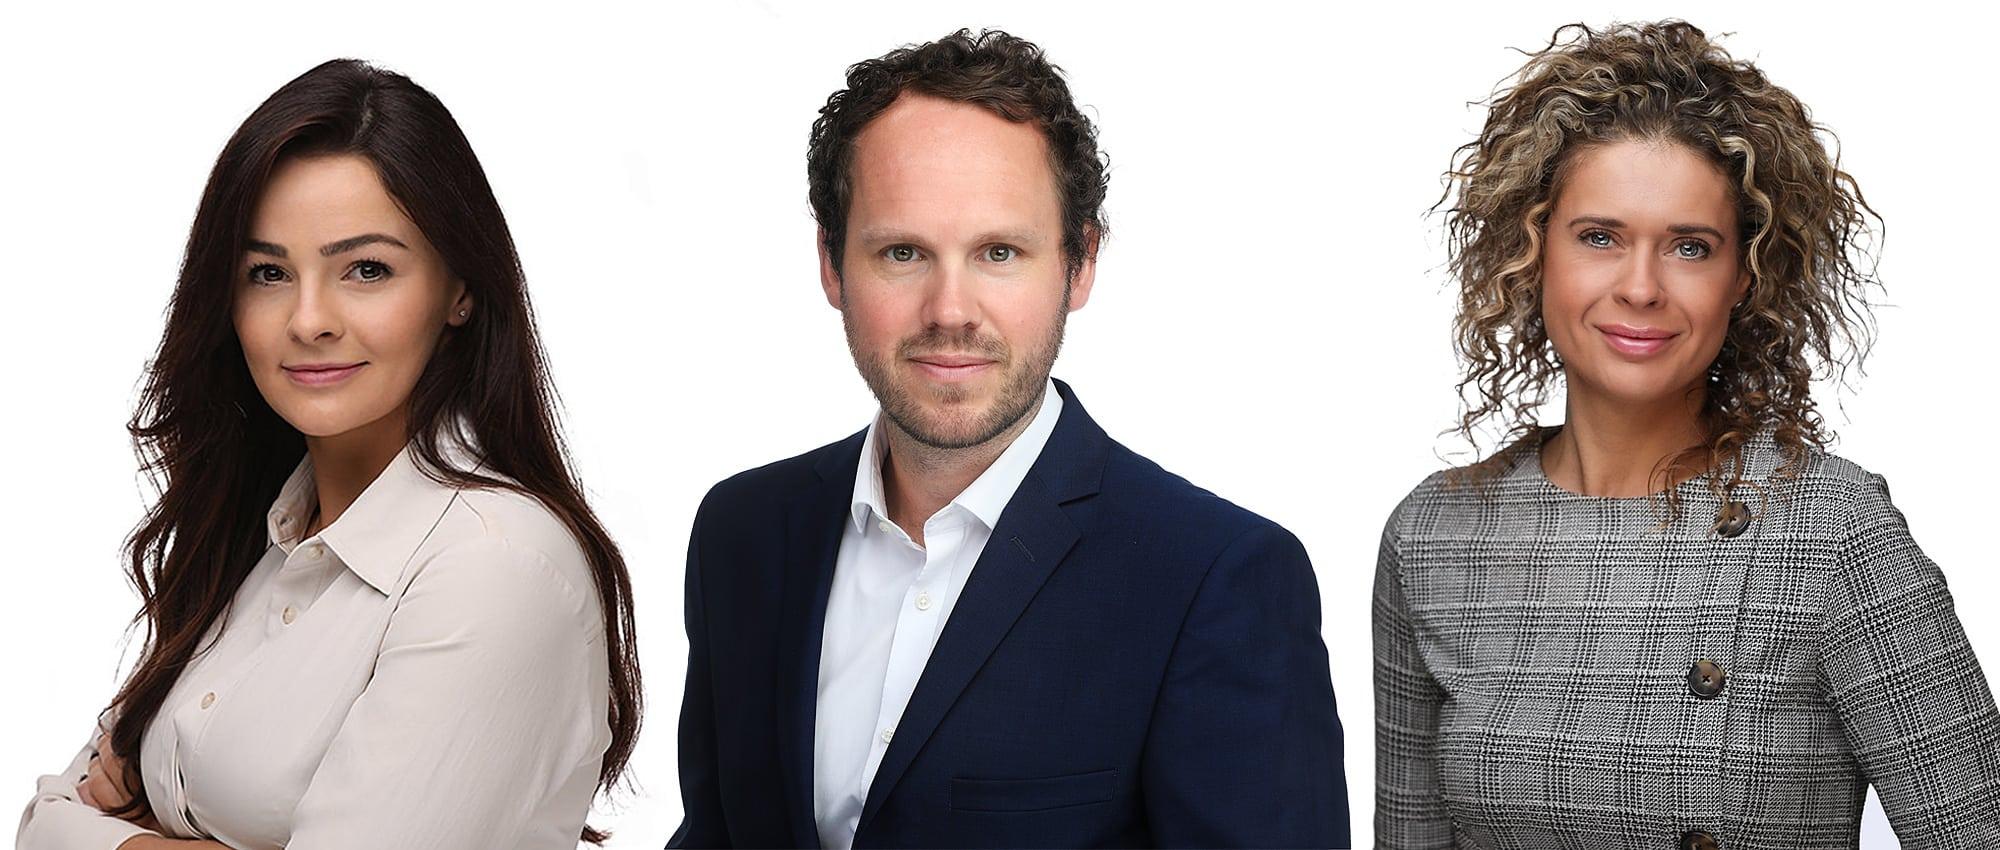 Corporate Headshots in London and Bristol